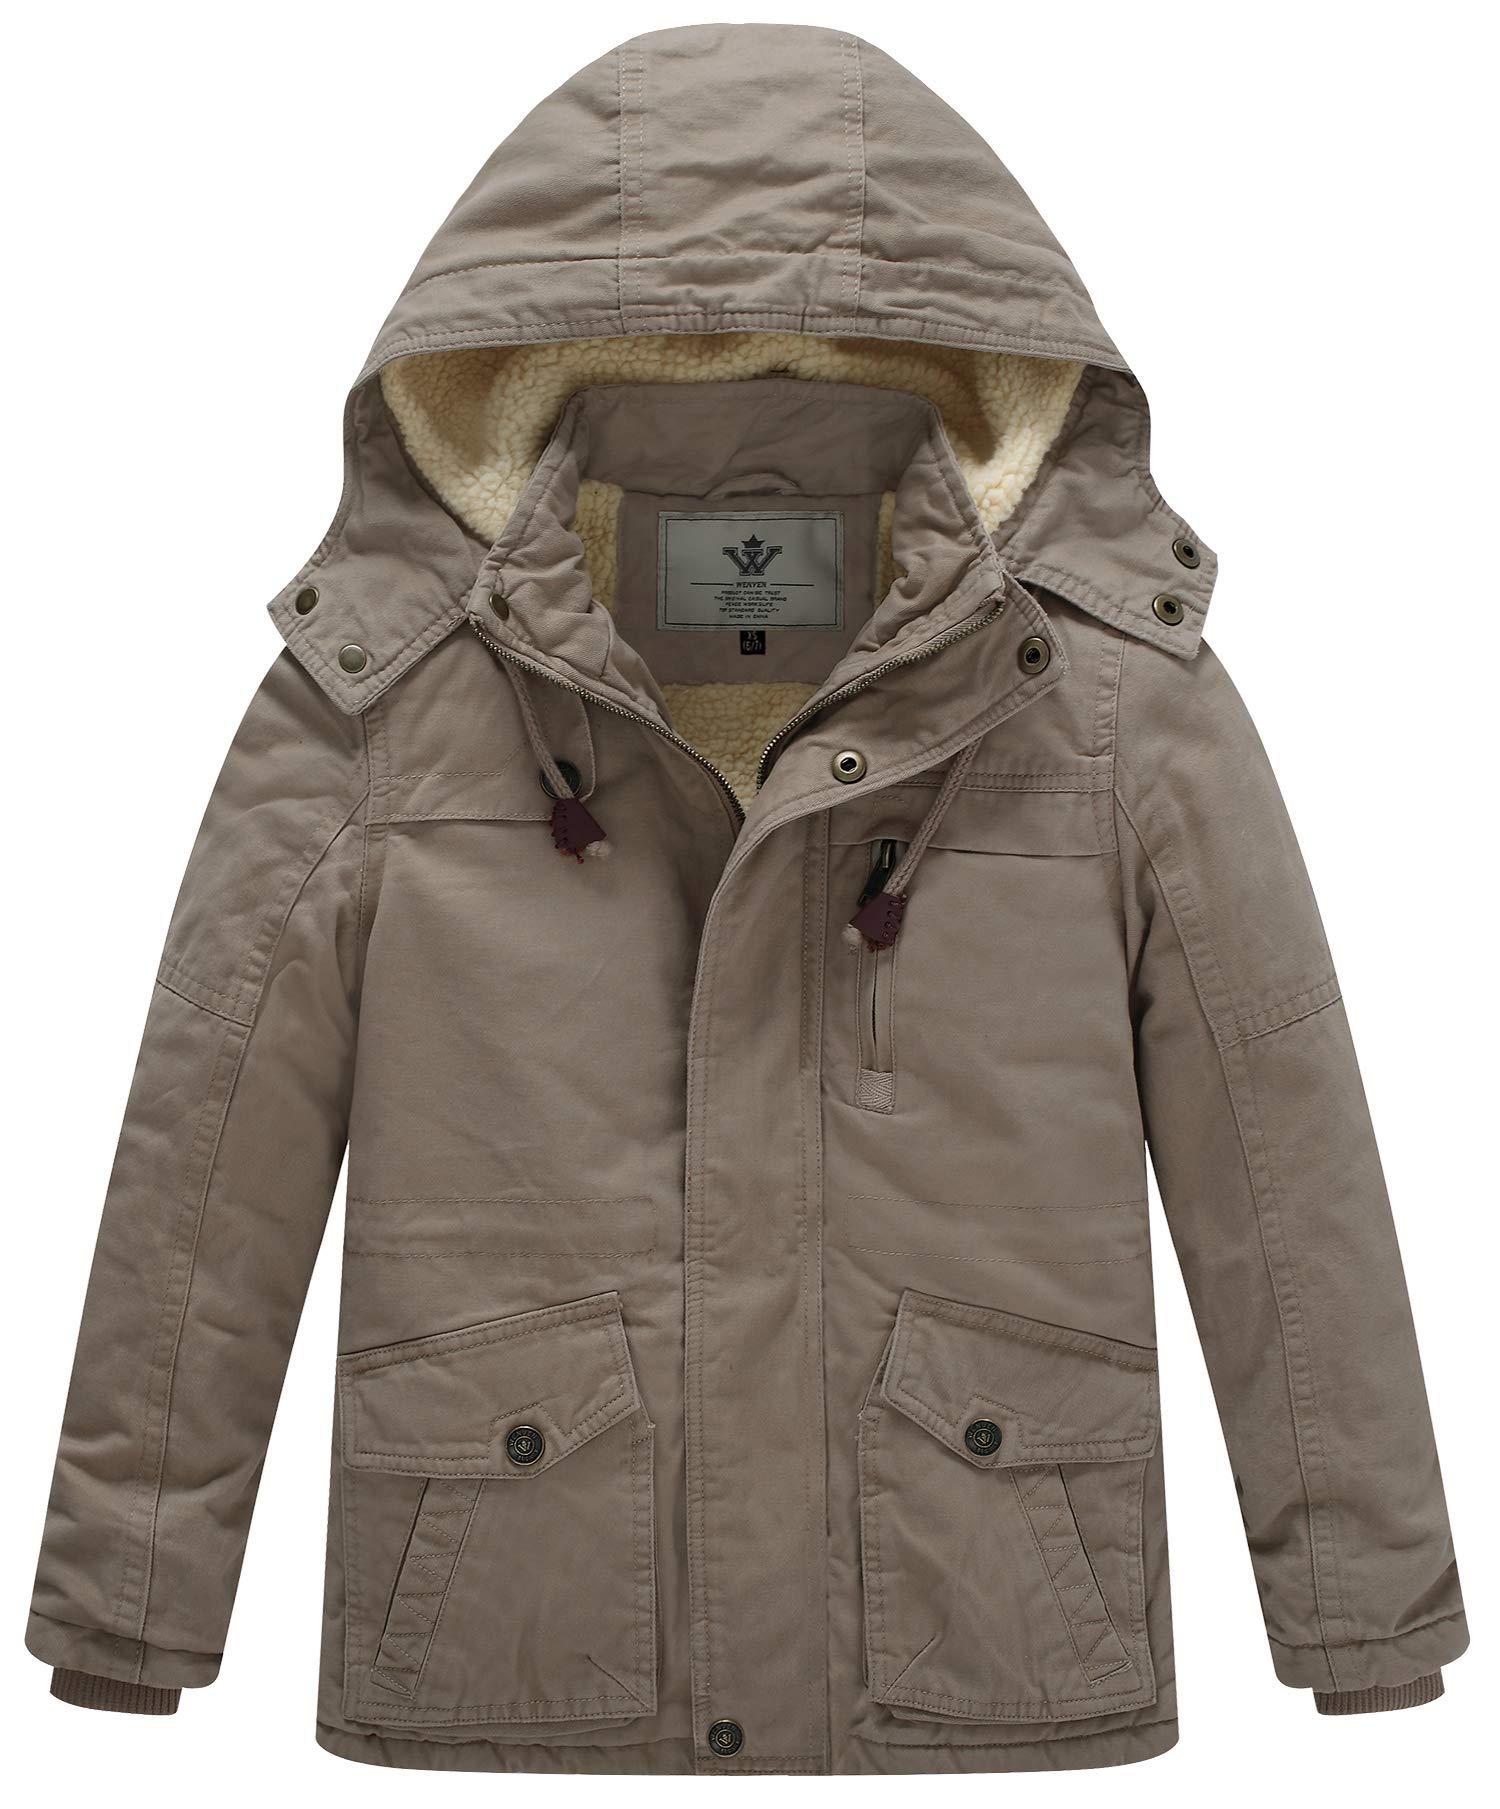 WenVen Boy's and Girl's Cotton Heavy Hooded Parka Coat(Khaki,X-Small-6-7)